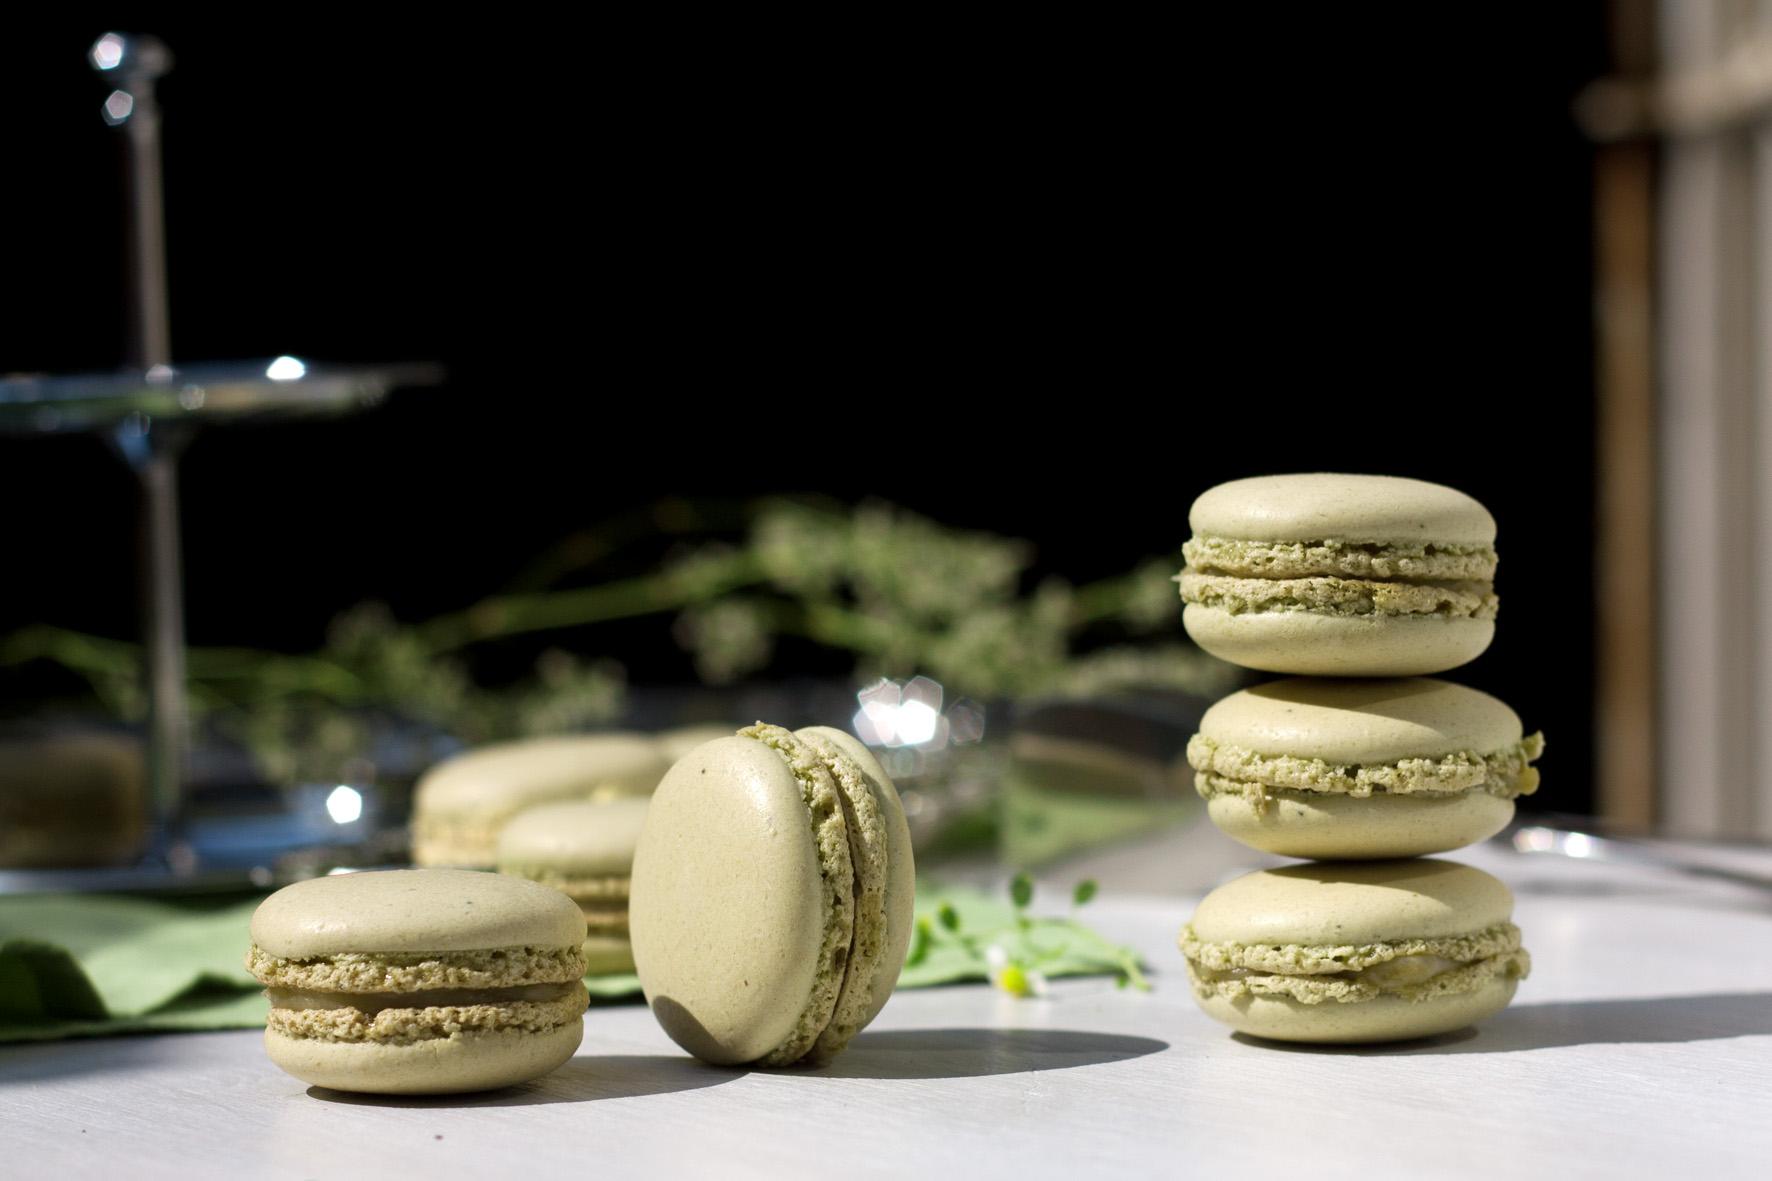 rhabarber-macarons-3